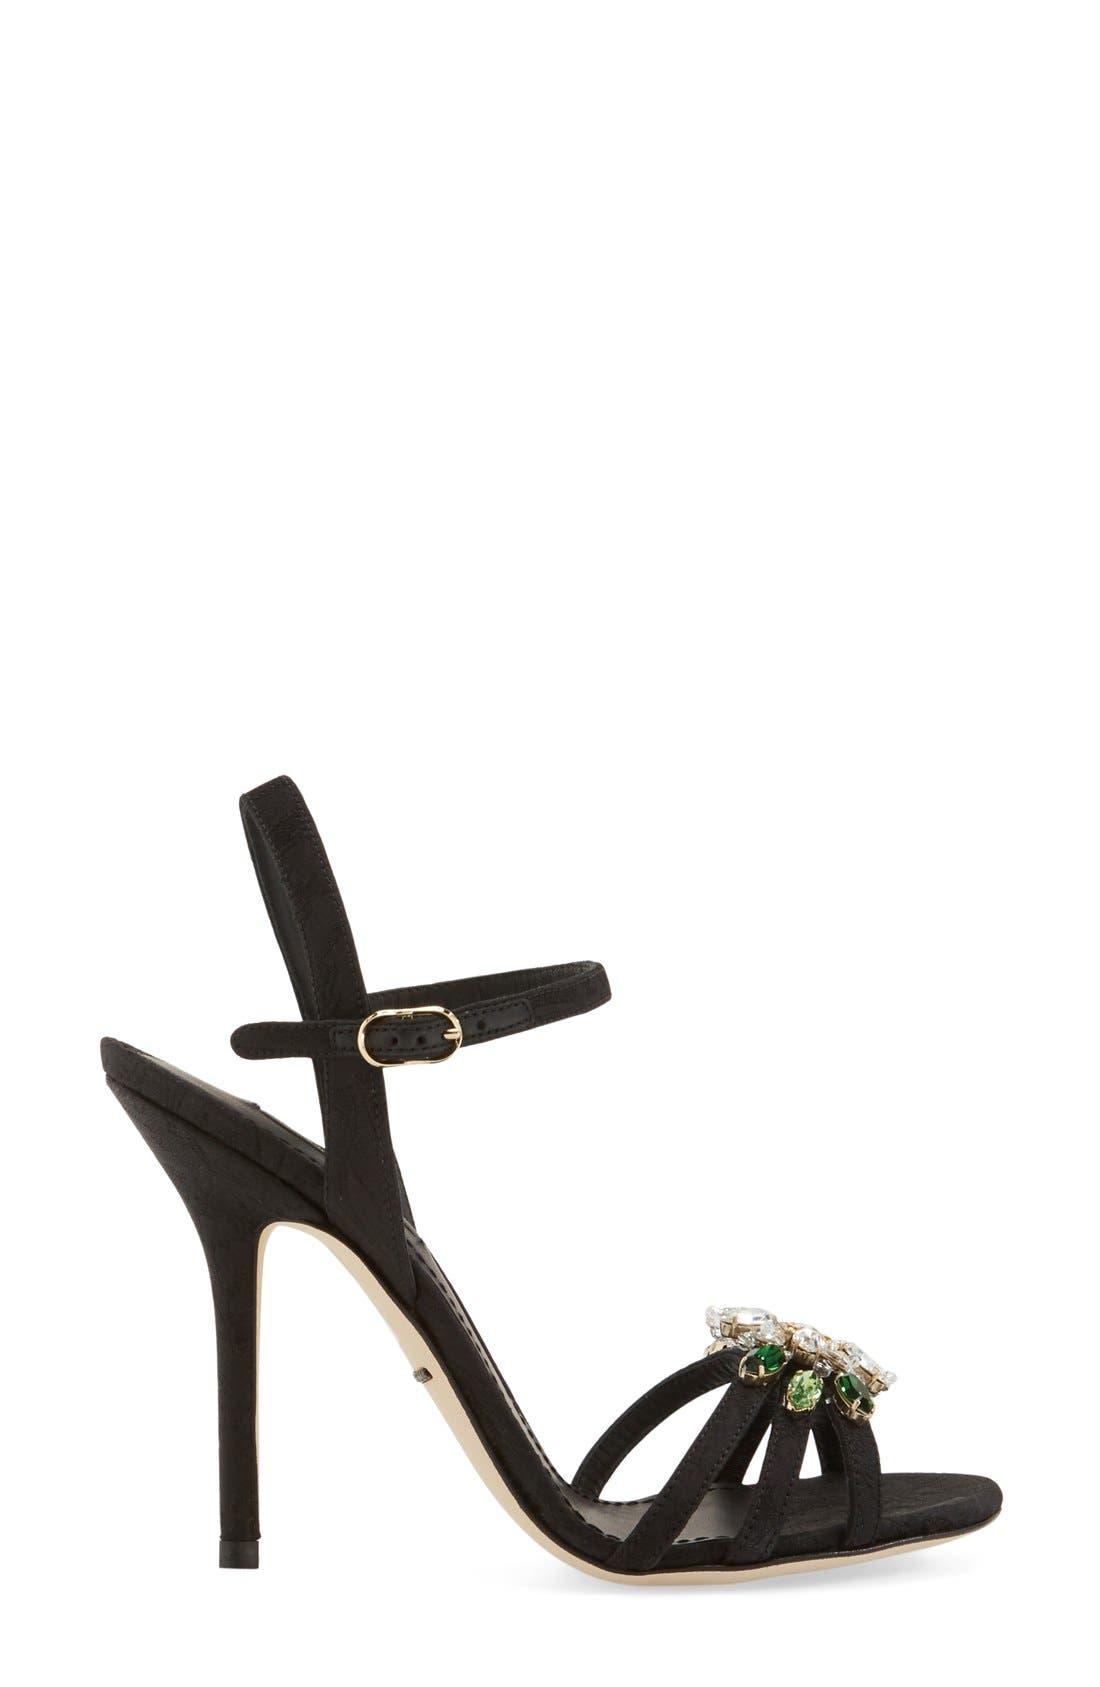 DOLCE&GABBANA, Jeweled Strappy Sandal, Alternate thumbnail 2, color, 001